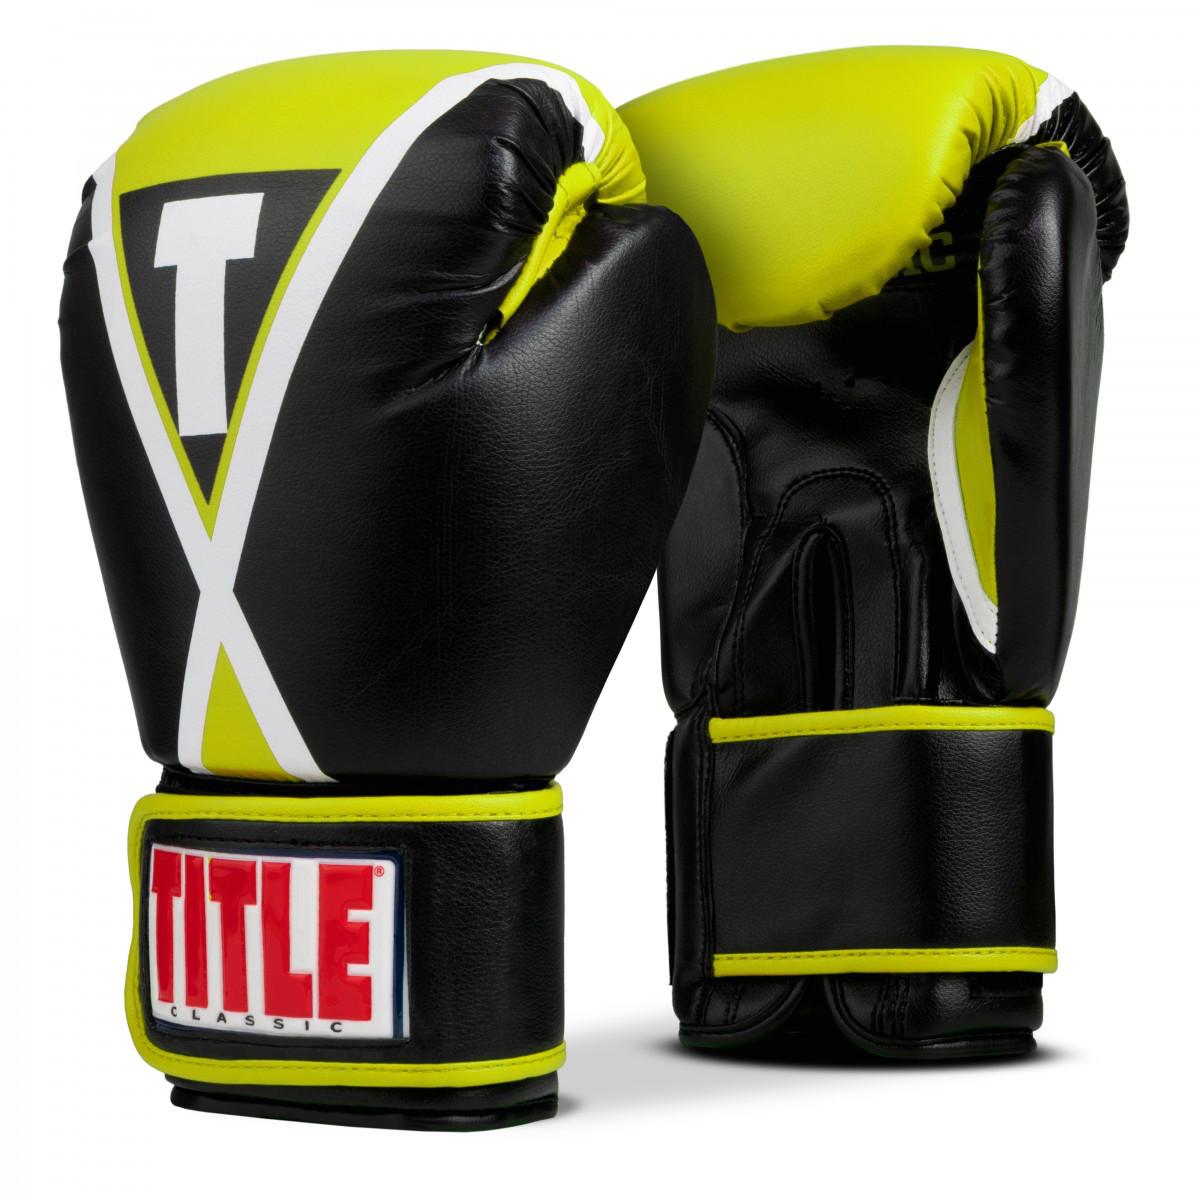 Боксерские перчатки TITLE Classic X-Press Boxing Gloves Black/Lime